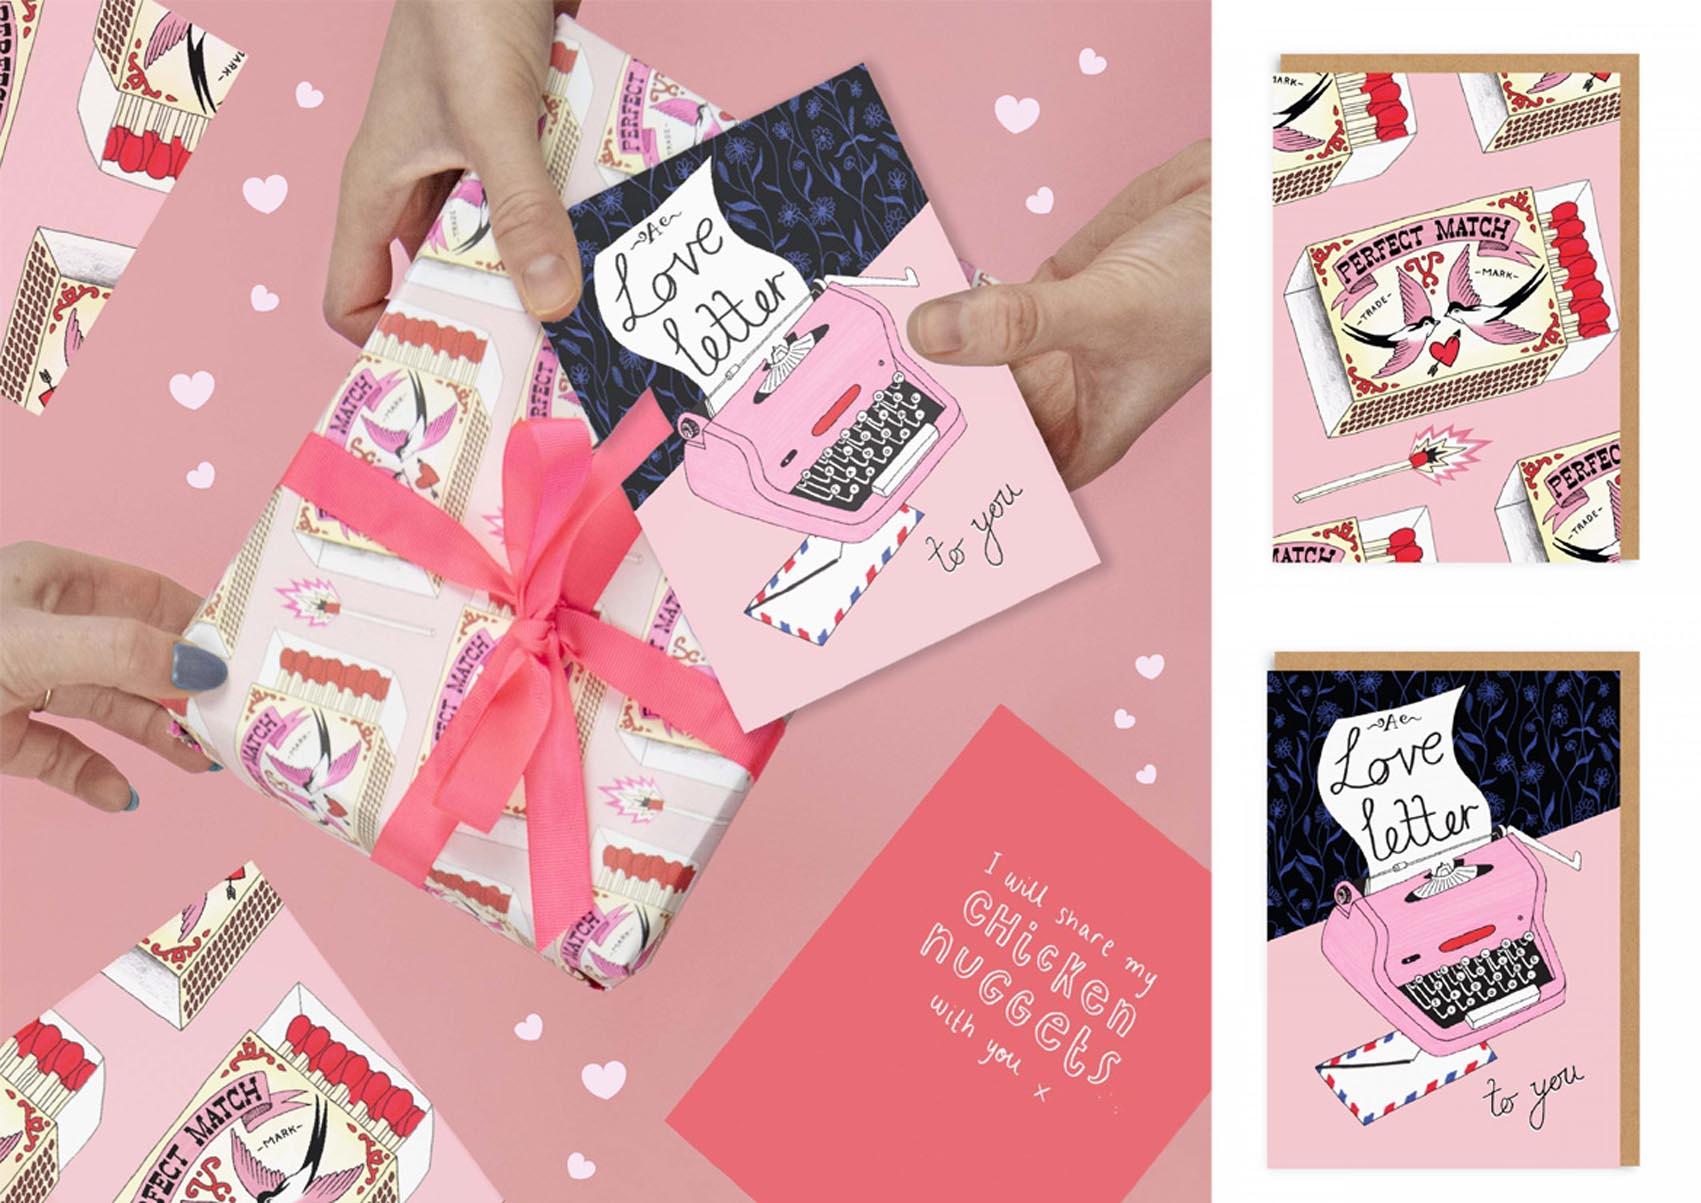 Ohh-Deer-Valentine-Designs-Stationery-1sm.jpg